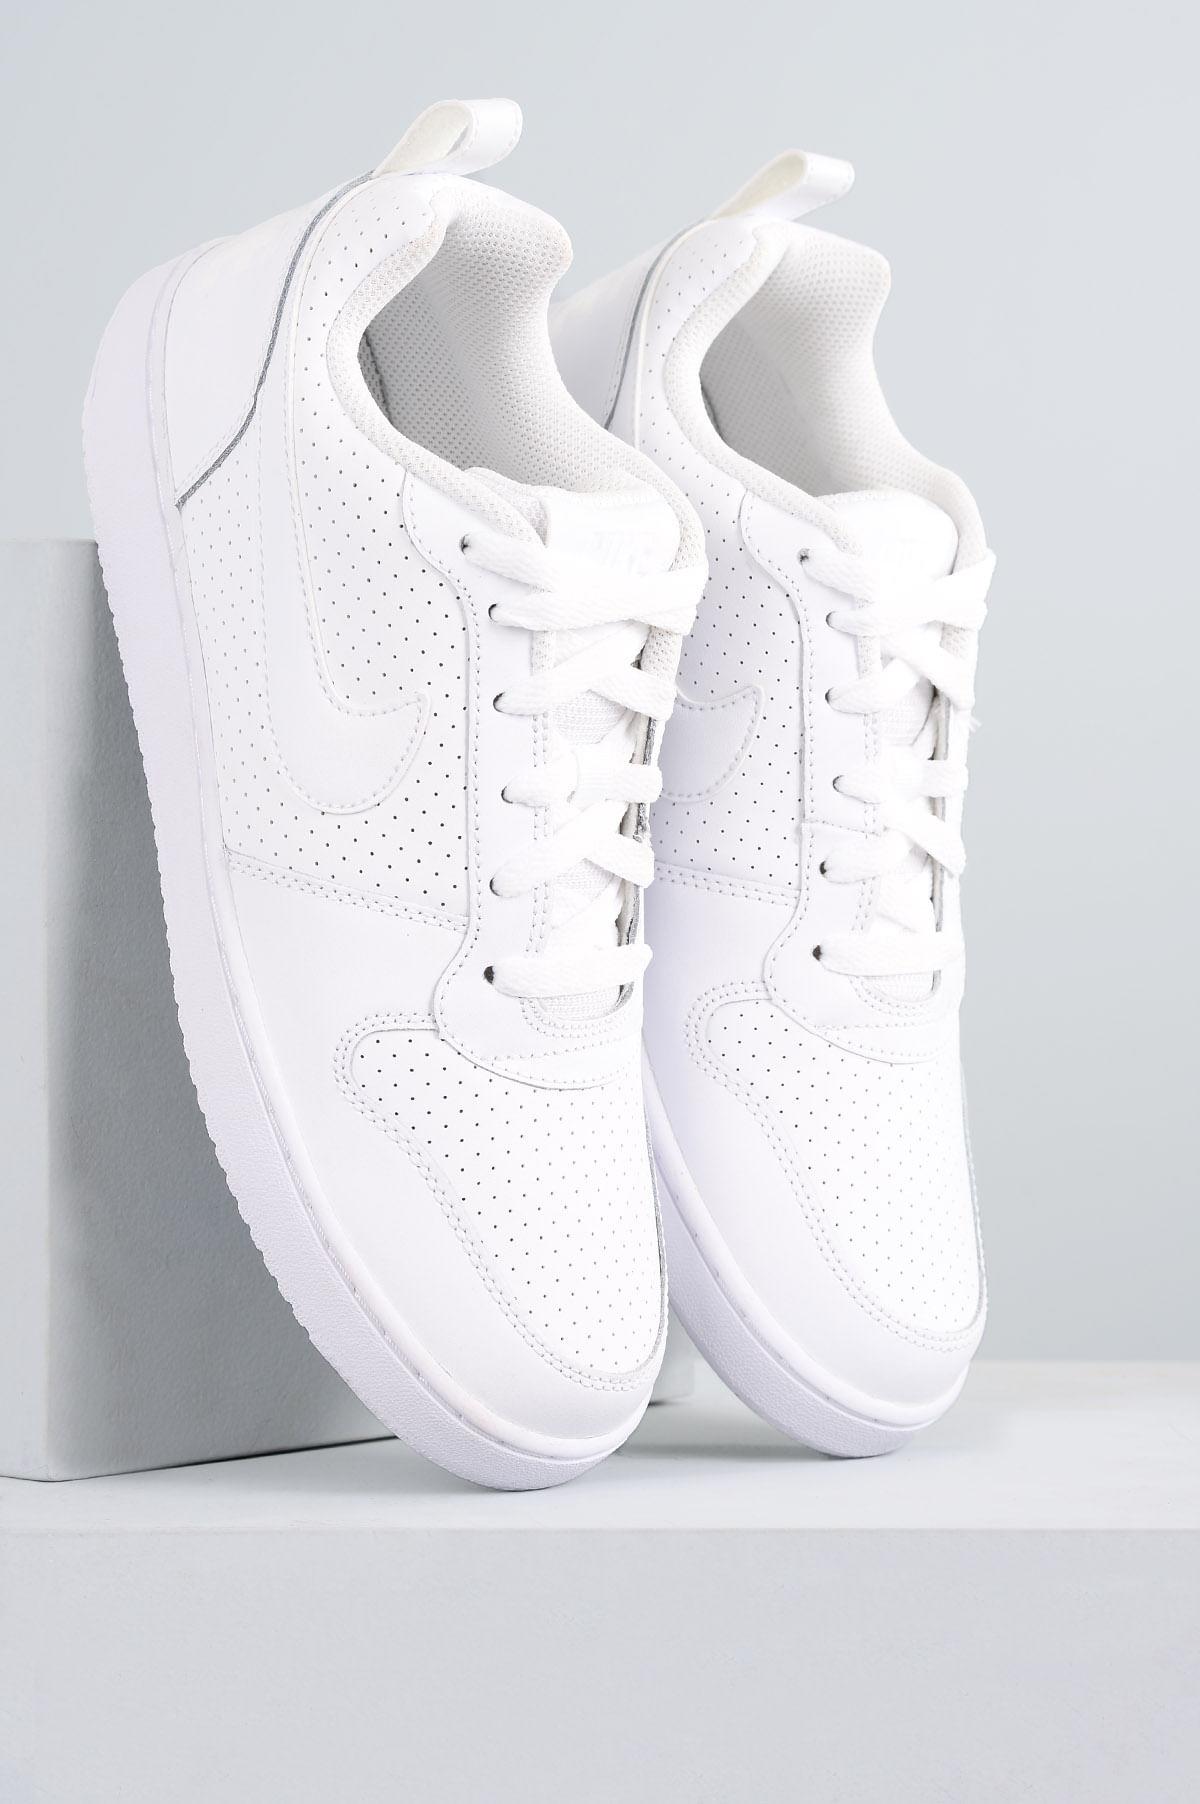 Tênis Nike Court Borough Low SINT - BRANCO - Mundial Calçados 13d700f9b4b2d